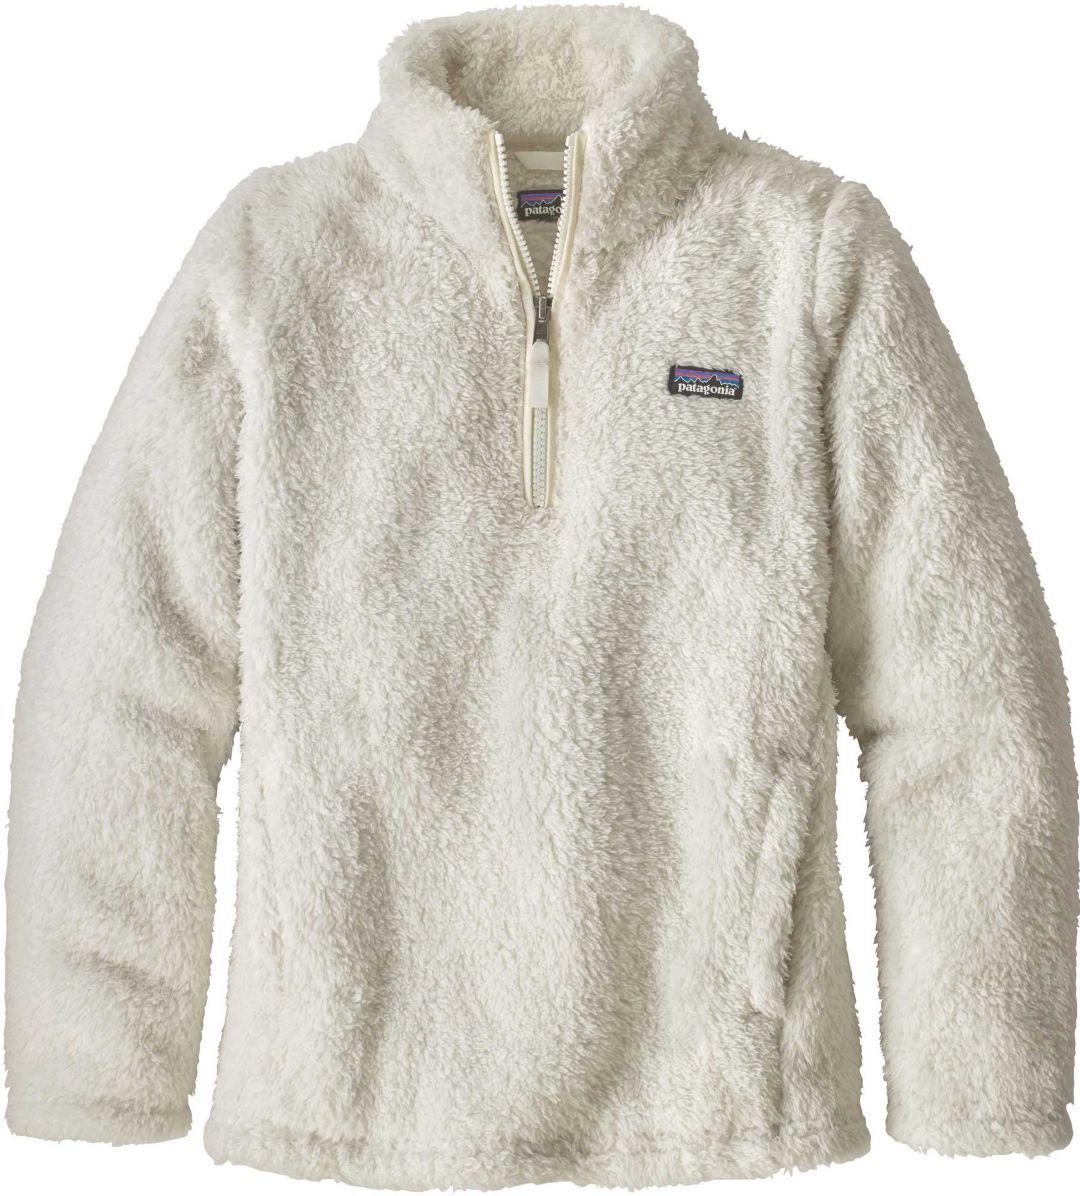 e7b2d7fab Patagonia Girls' Los Gatos Quarter Zip Fleece Jacket